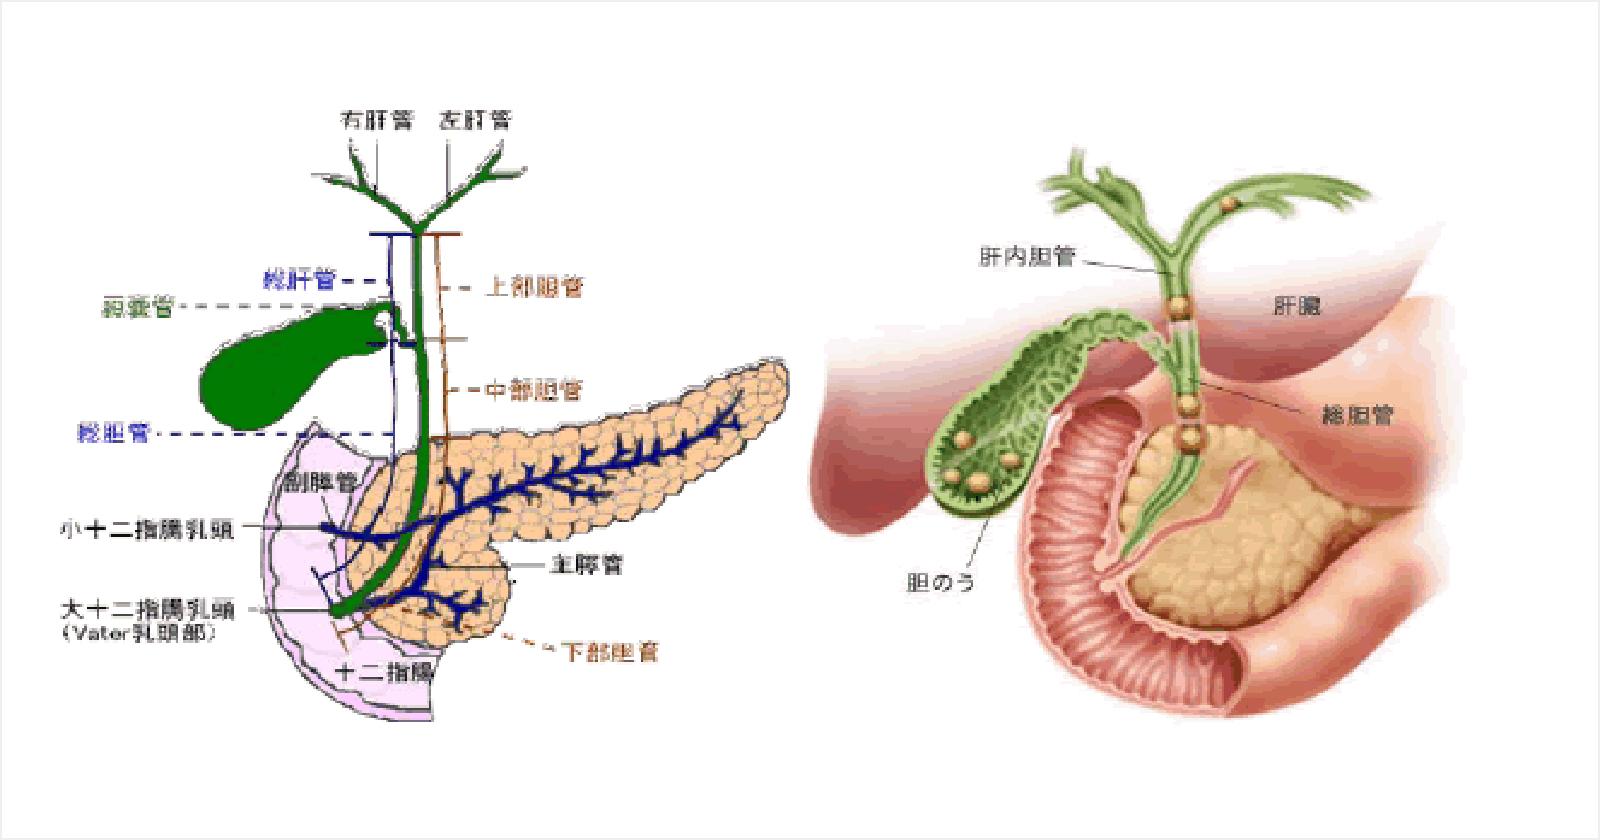 ERCP(内視鏡的逆行性胆管膵管造影)